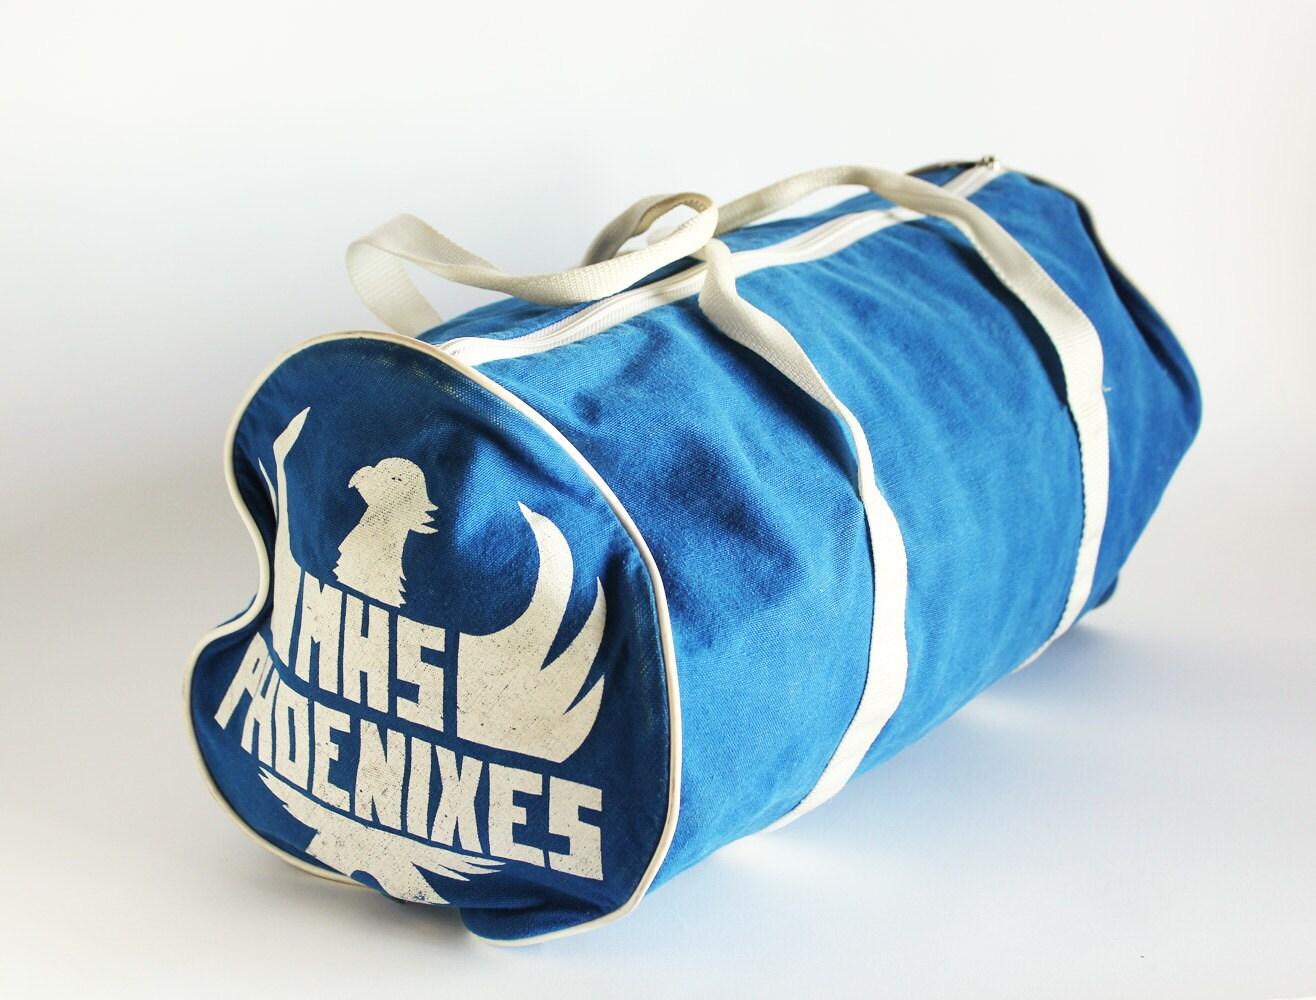 High School Gym Bag - Blue and White Duffle - Retro Eighties - MiesEnScene